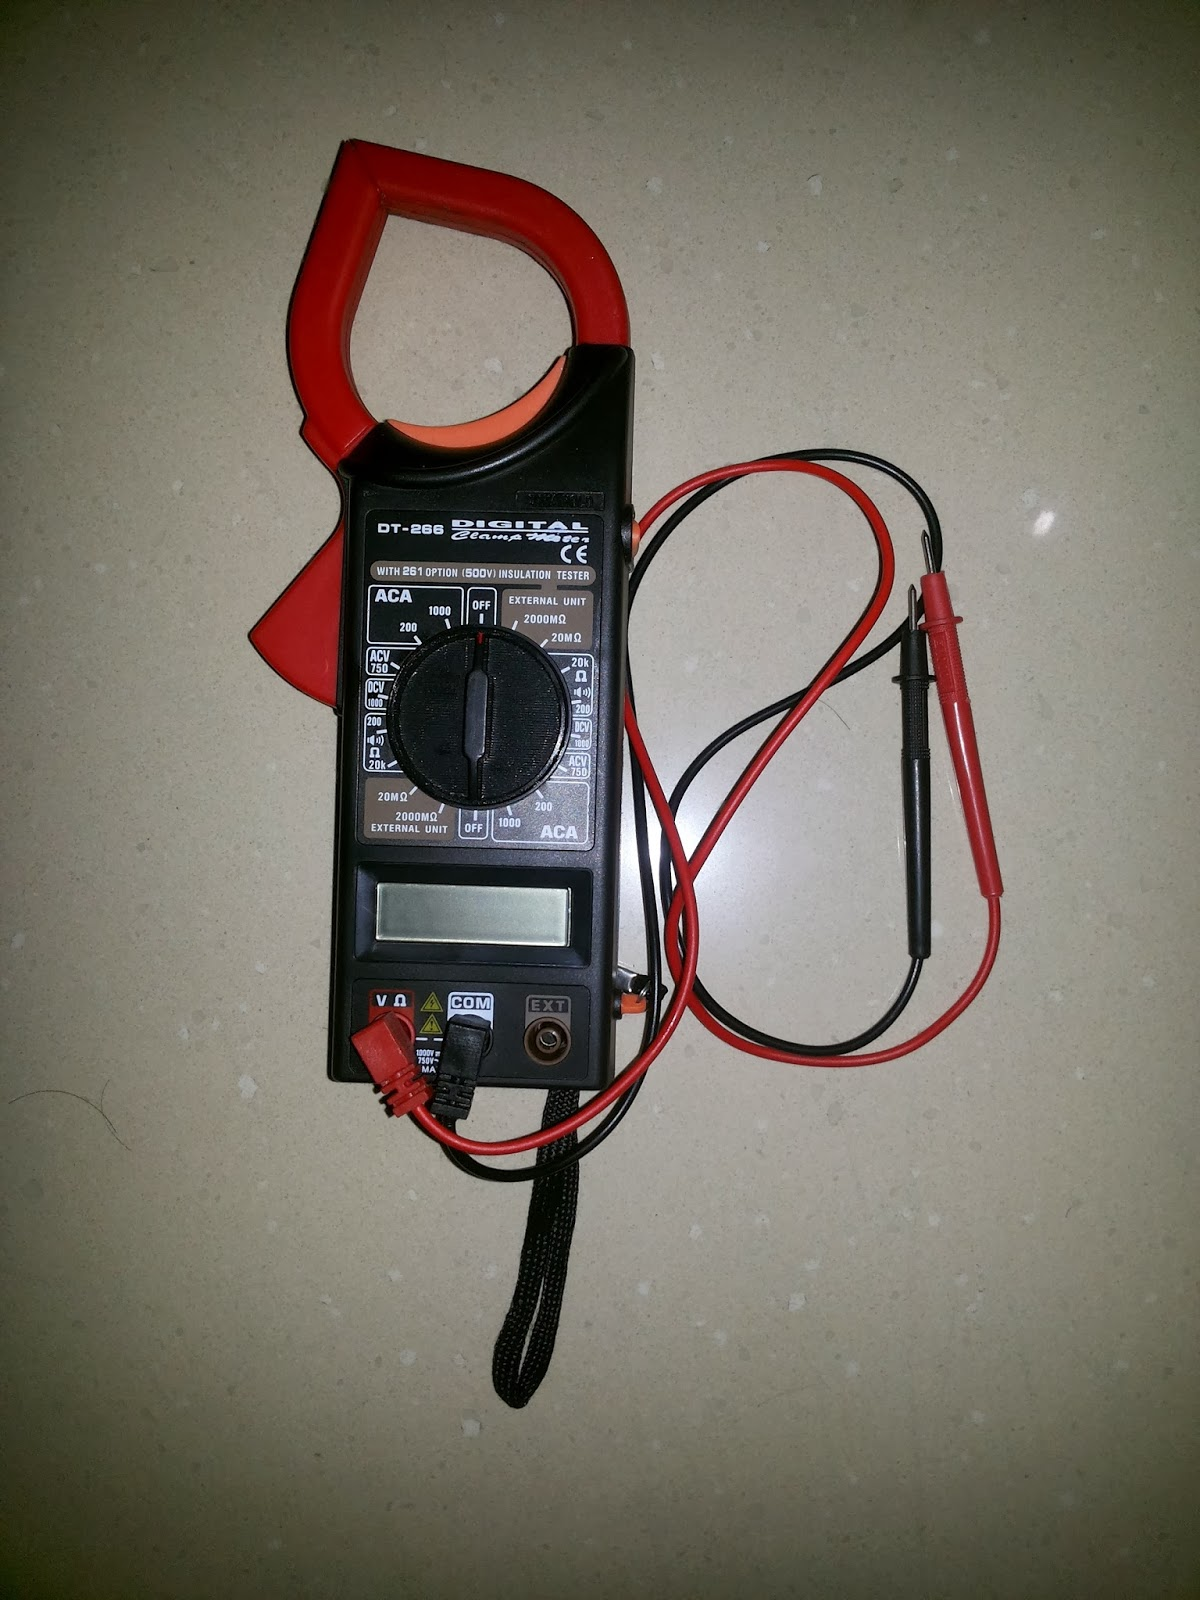 Clamp meter 266c инструкция